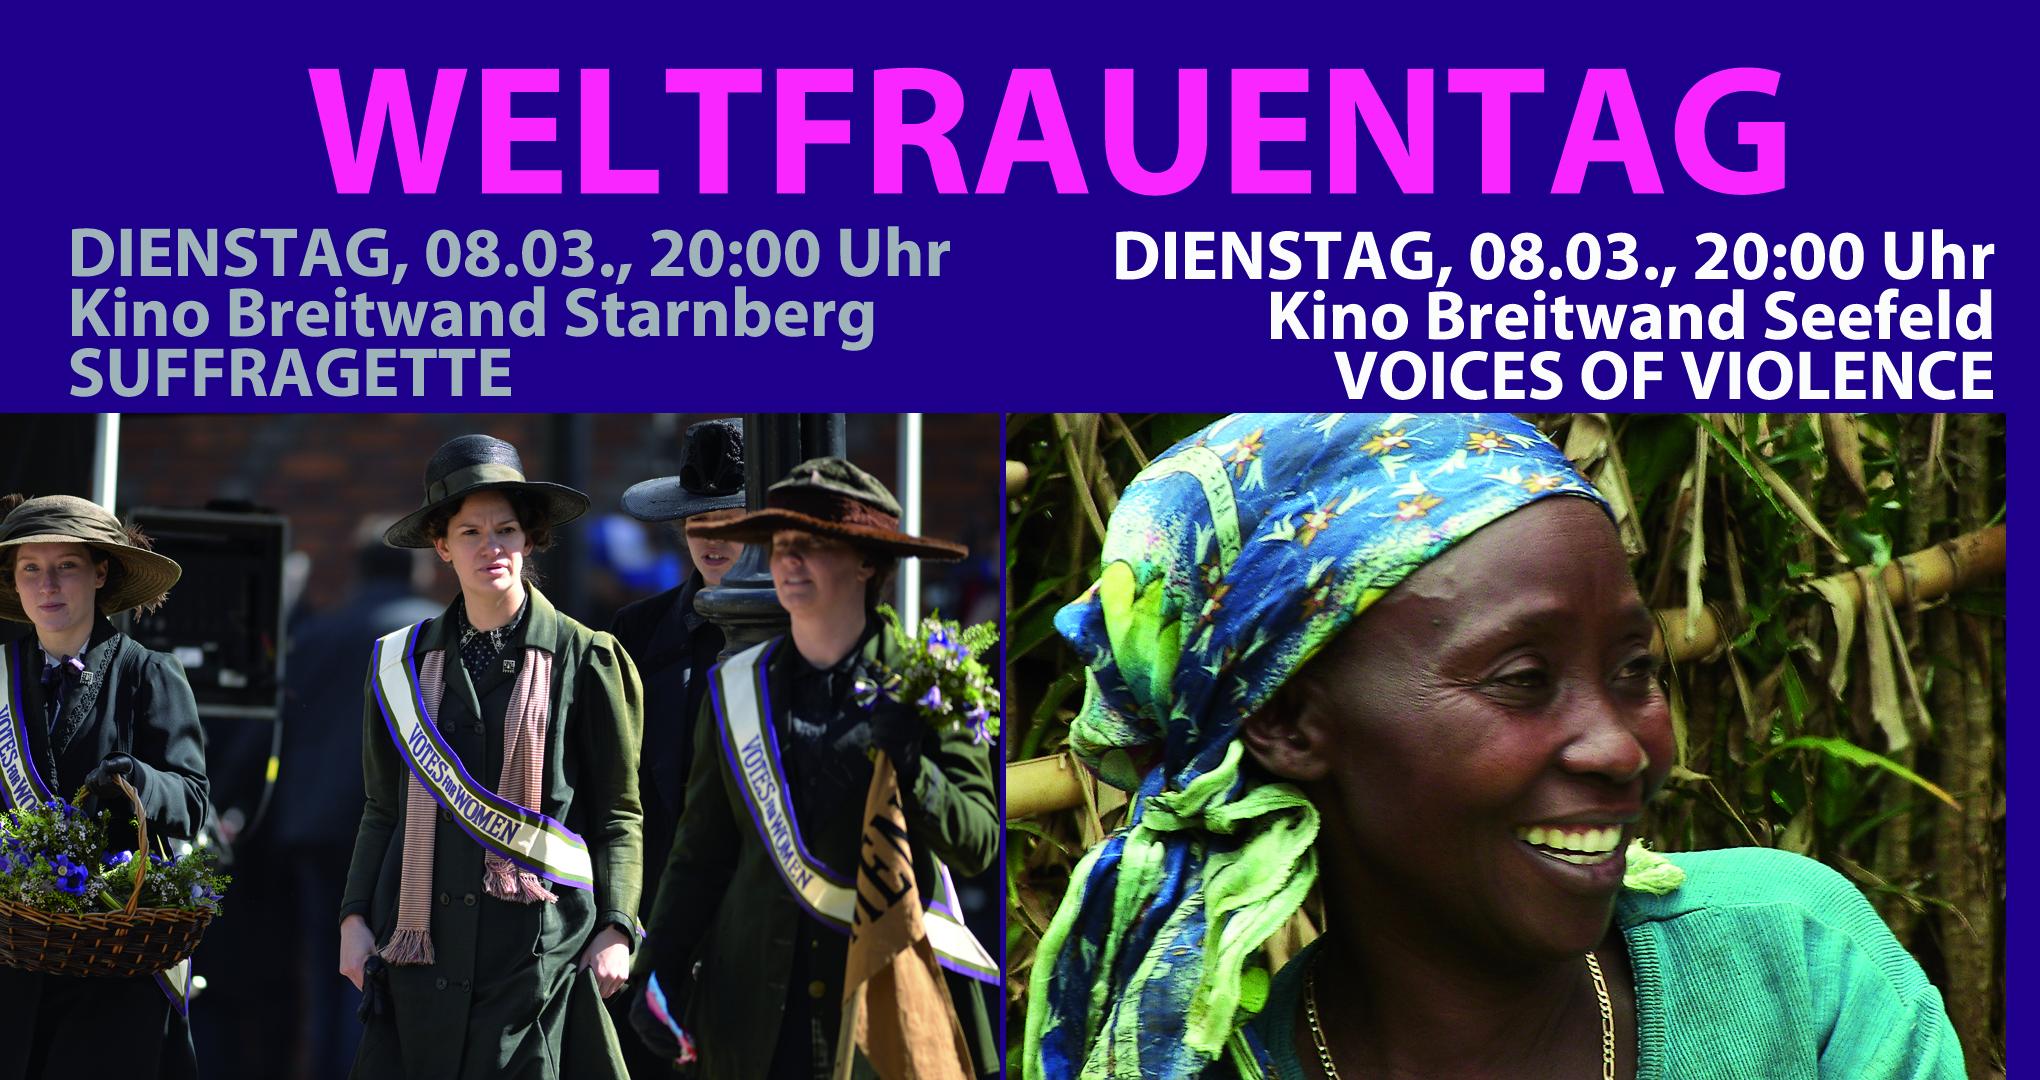 Kino Breitwand Starnberg